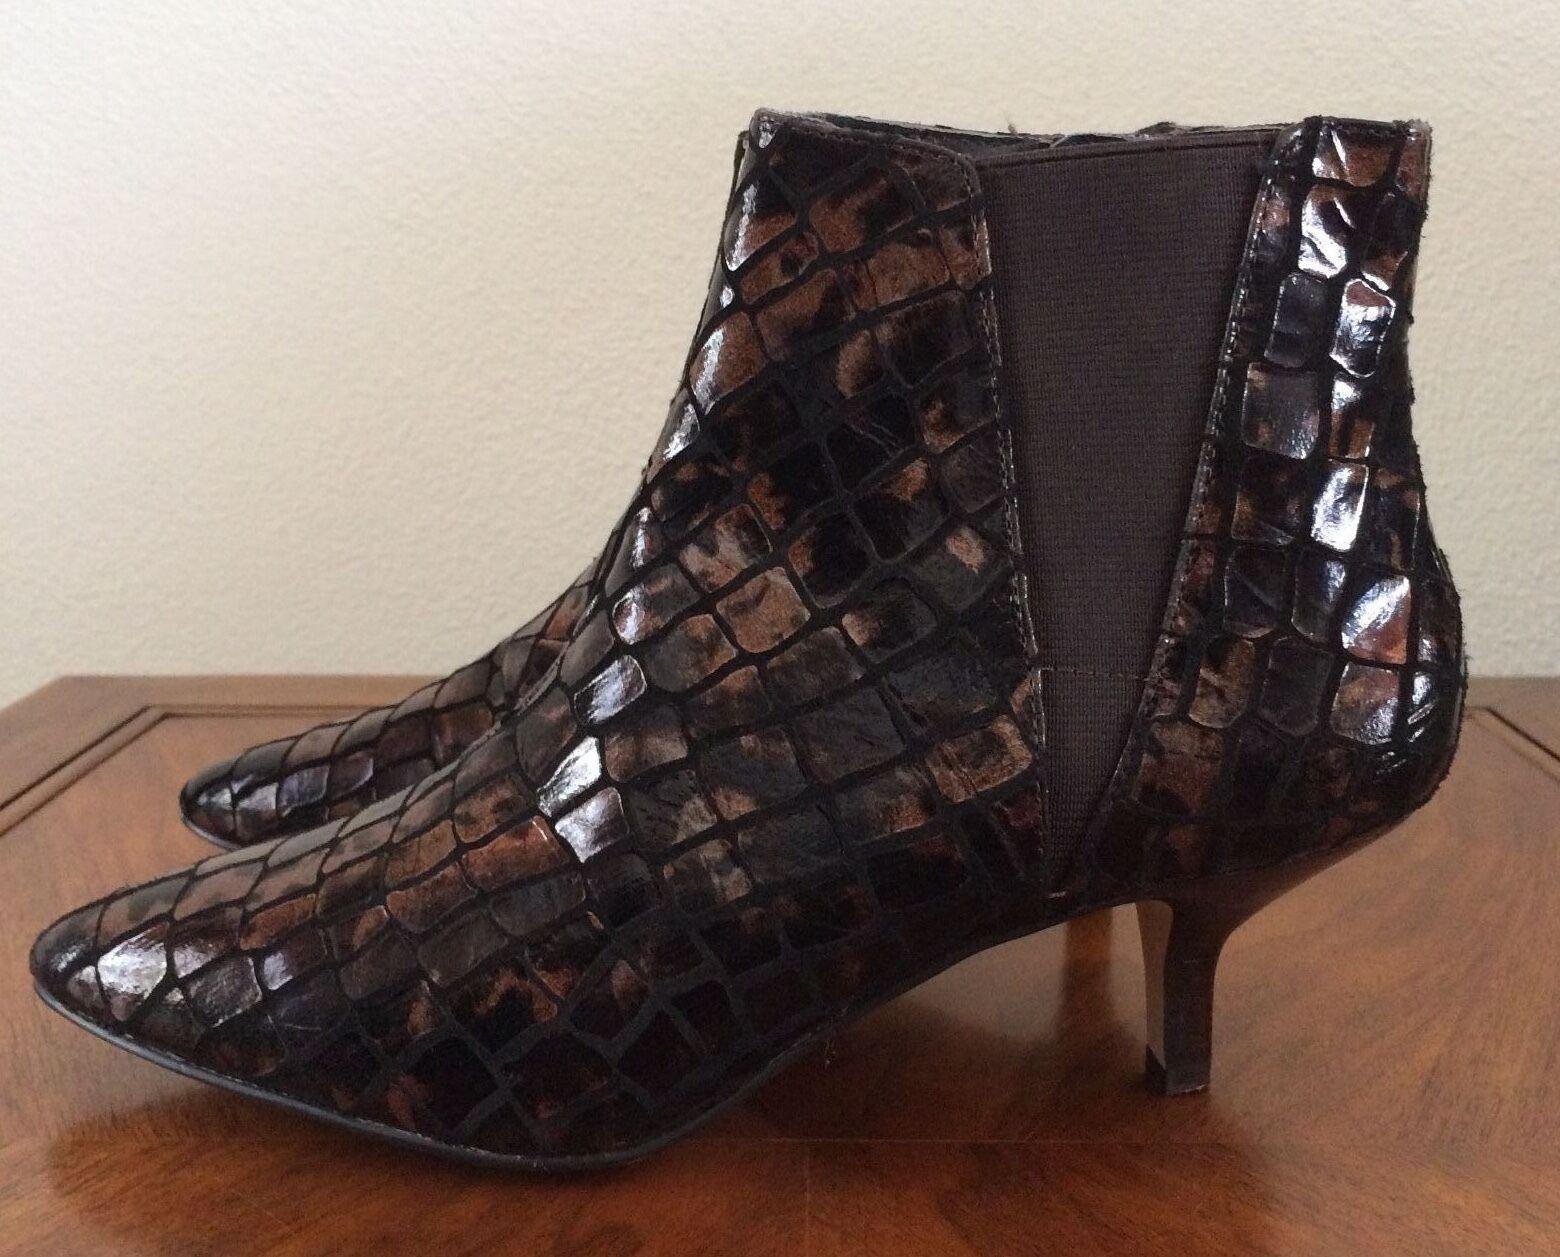 Donald J Pliner Geeo Embossed Metallic Leather Boots Booties Womens Size 6.5